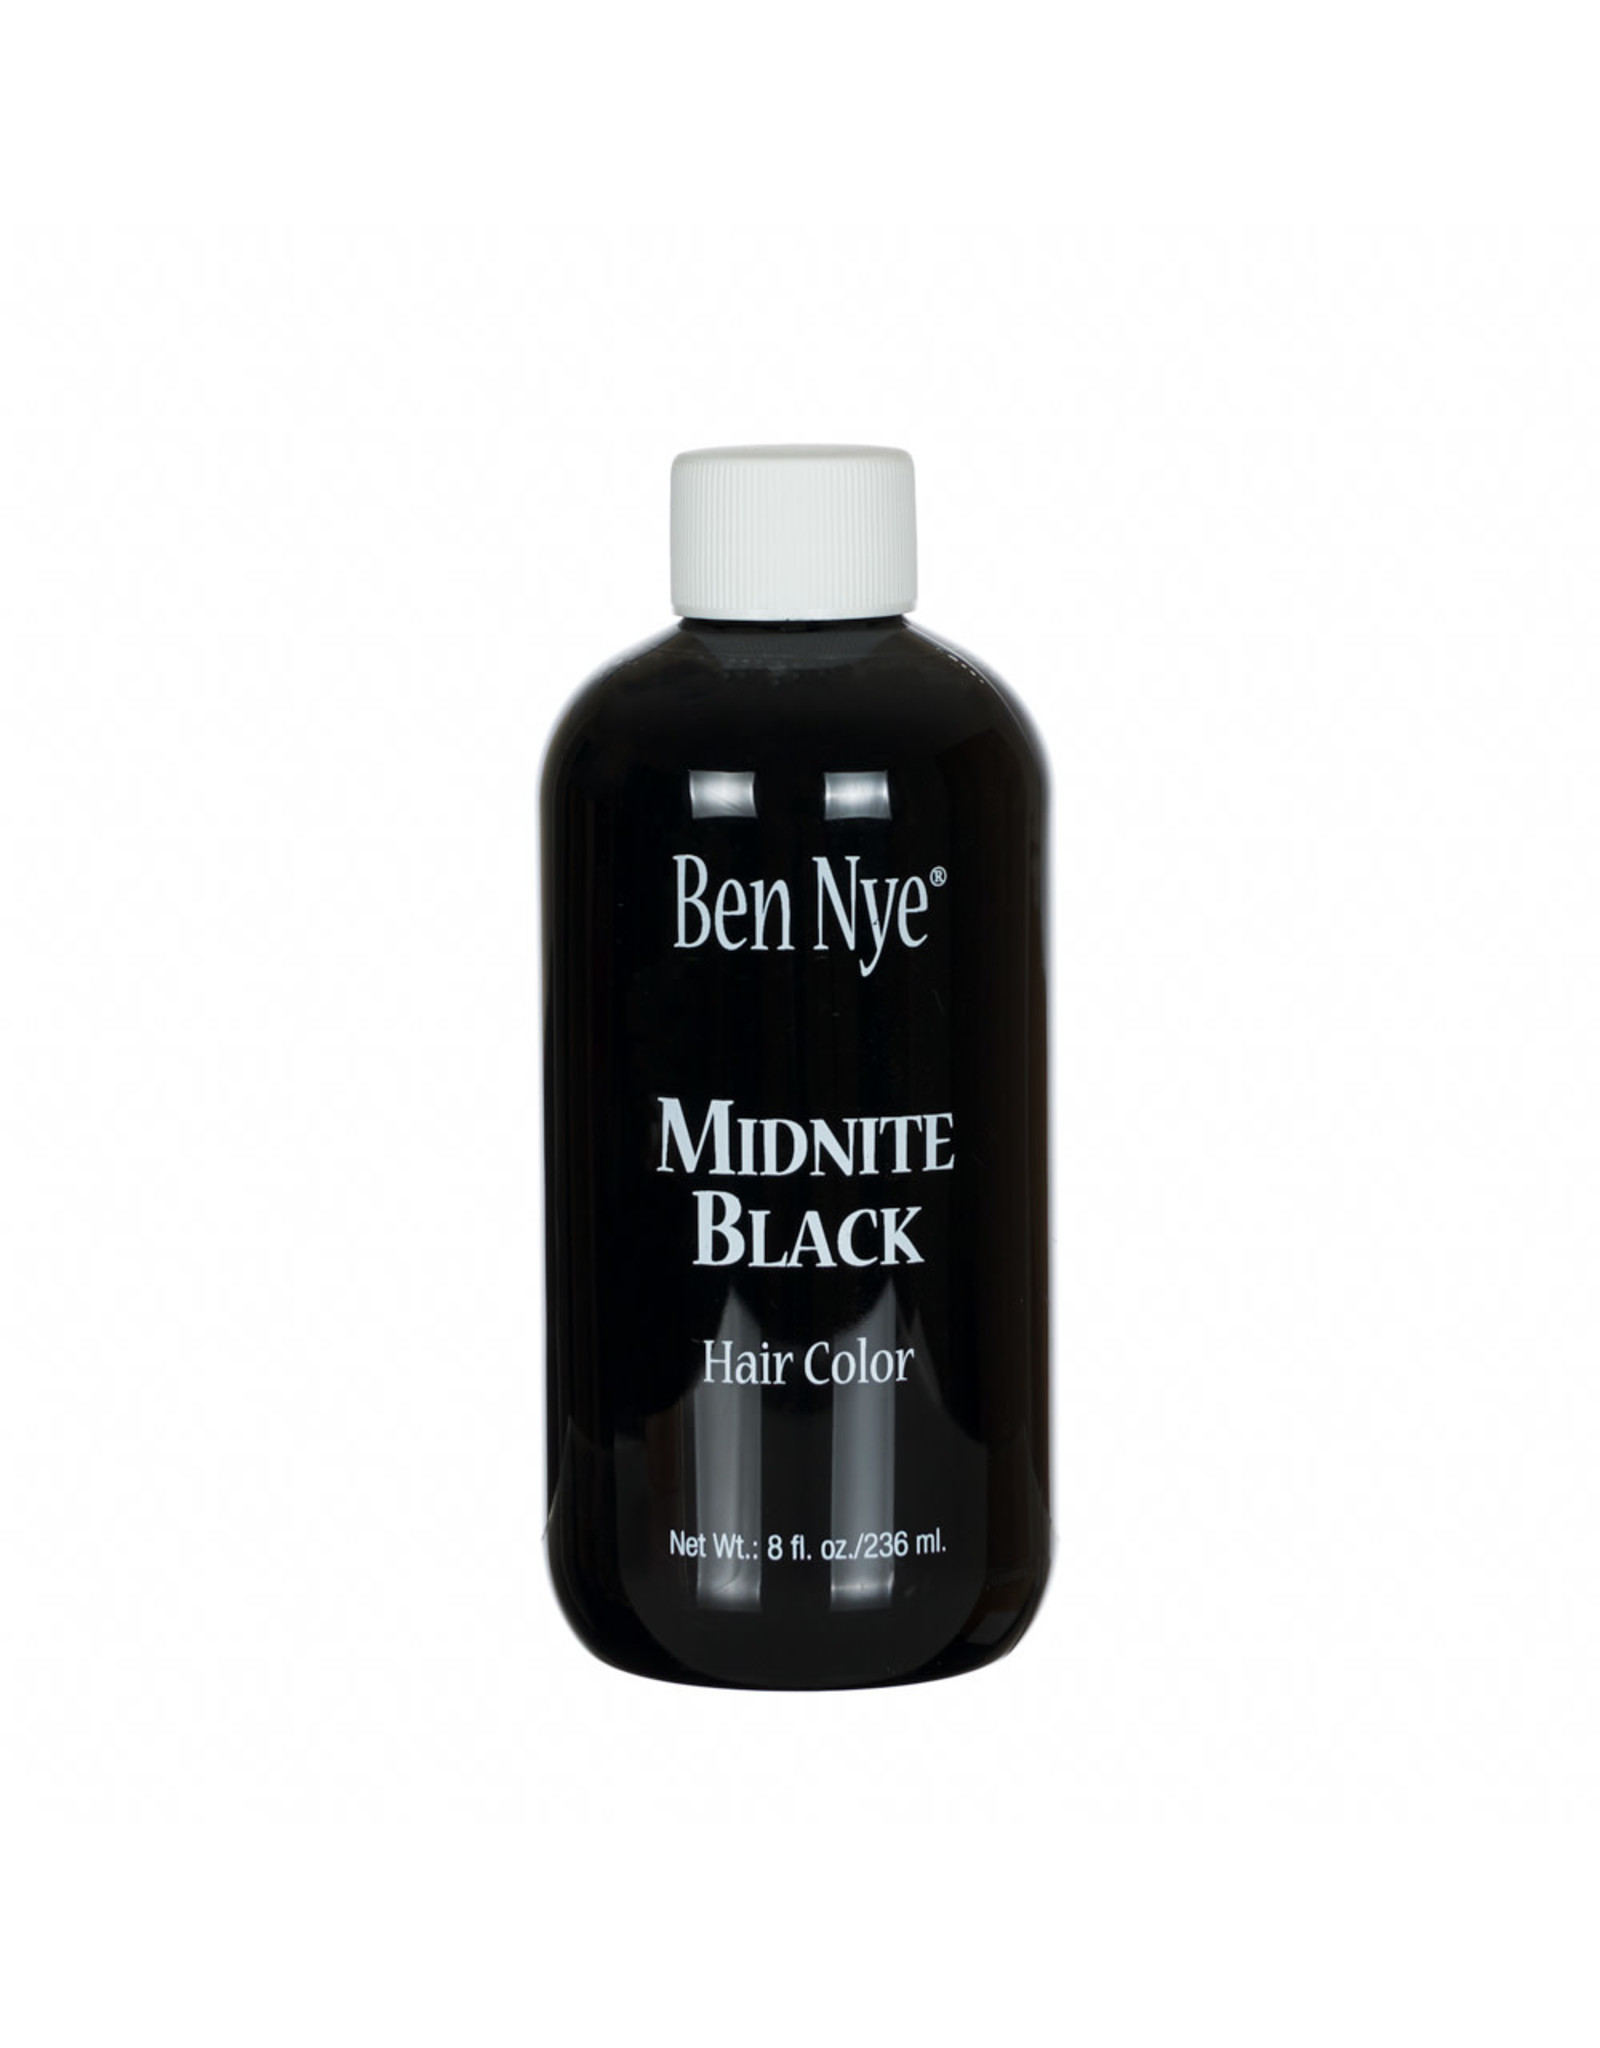 Ben Nye Ben Nye Midnite Black Hair Color